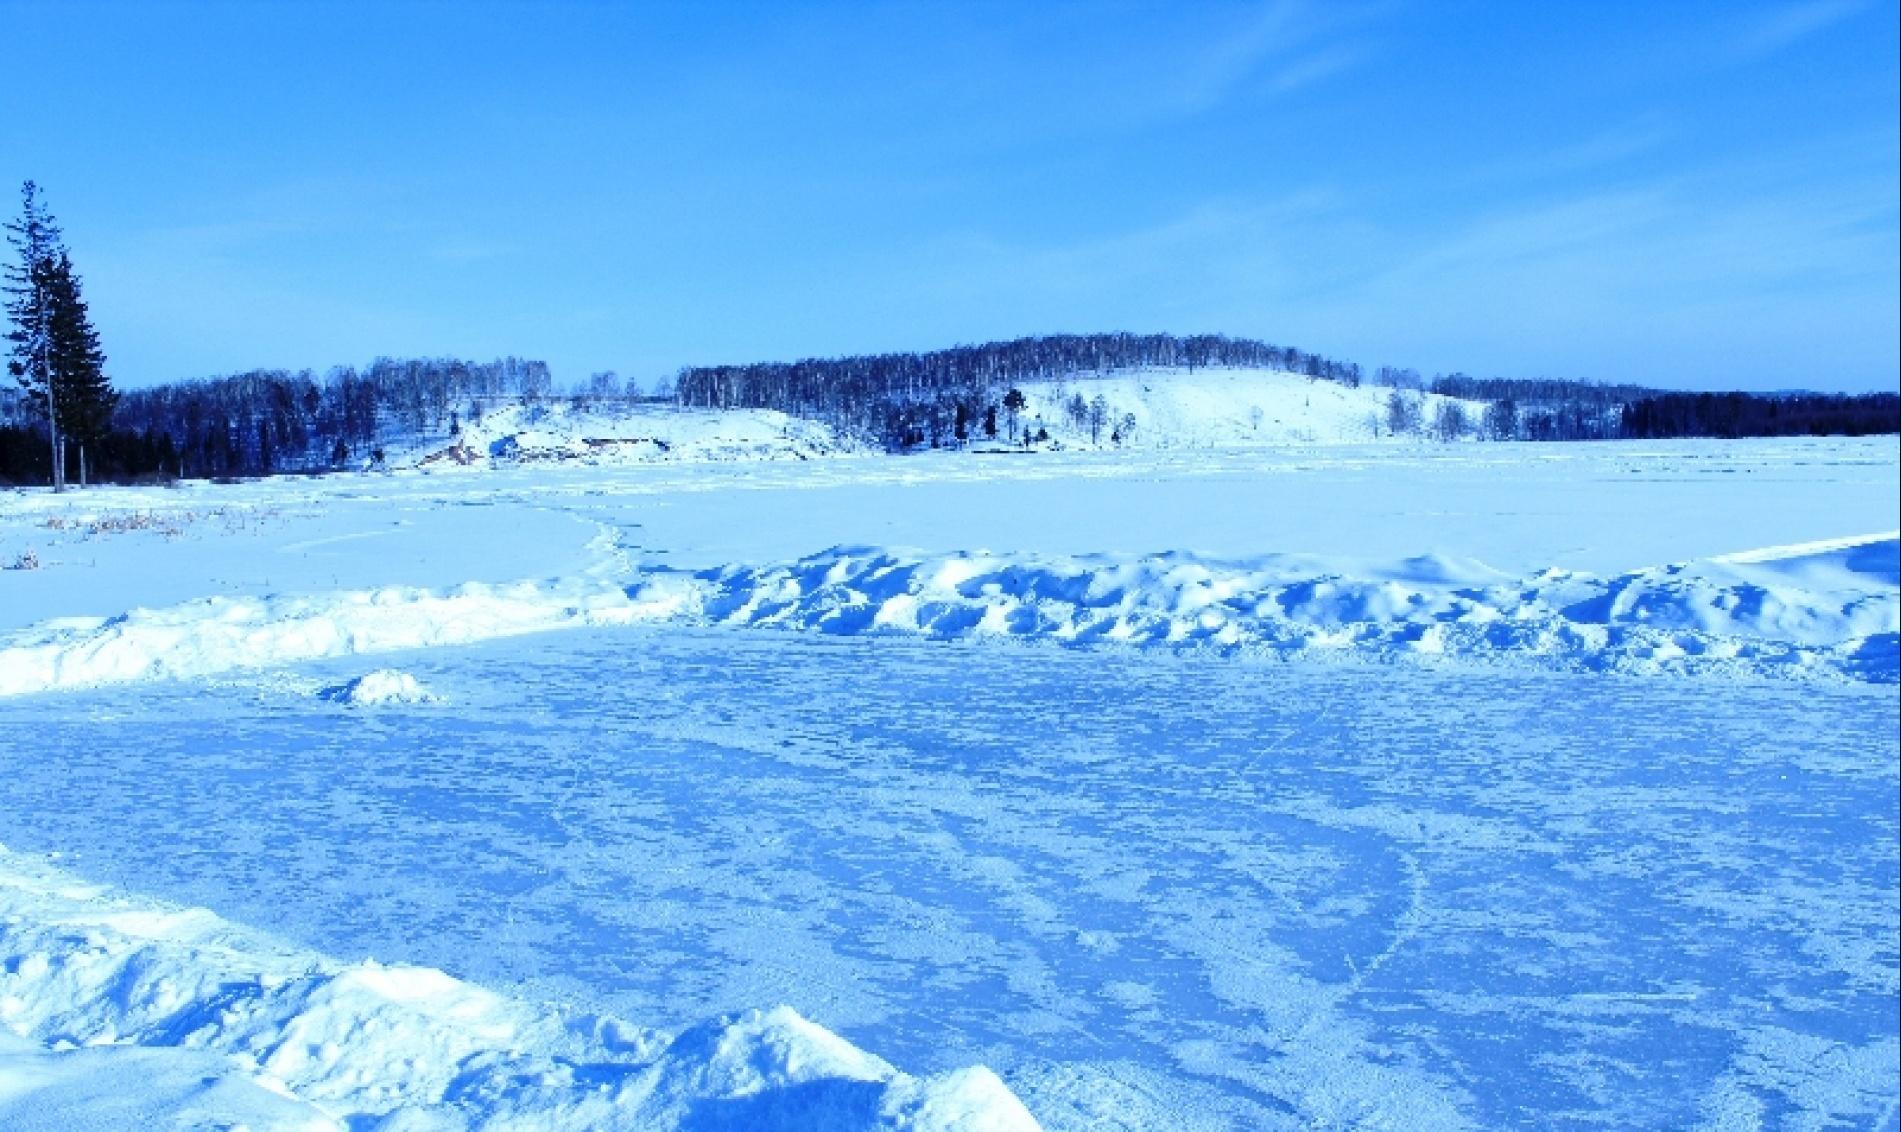 База отдыха «Раухова мельница» Красноярский край, фото 28